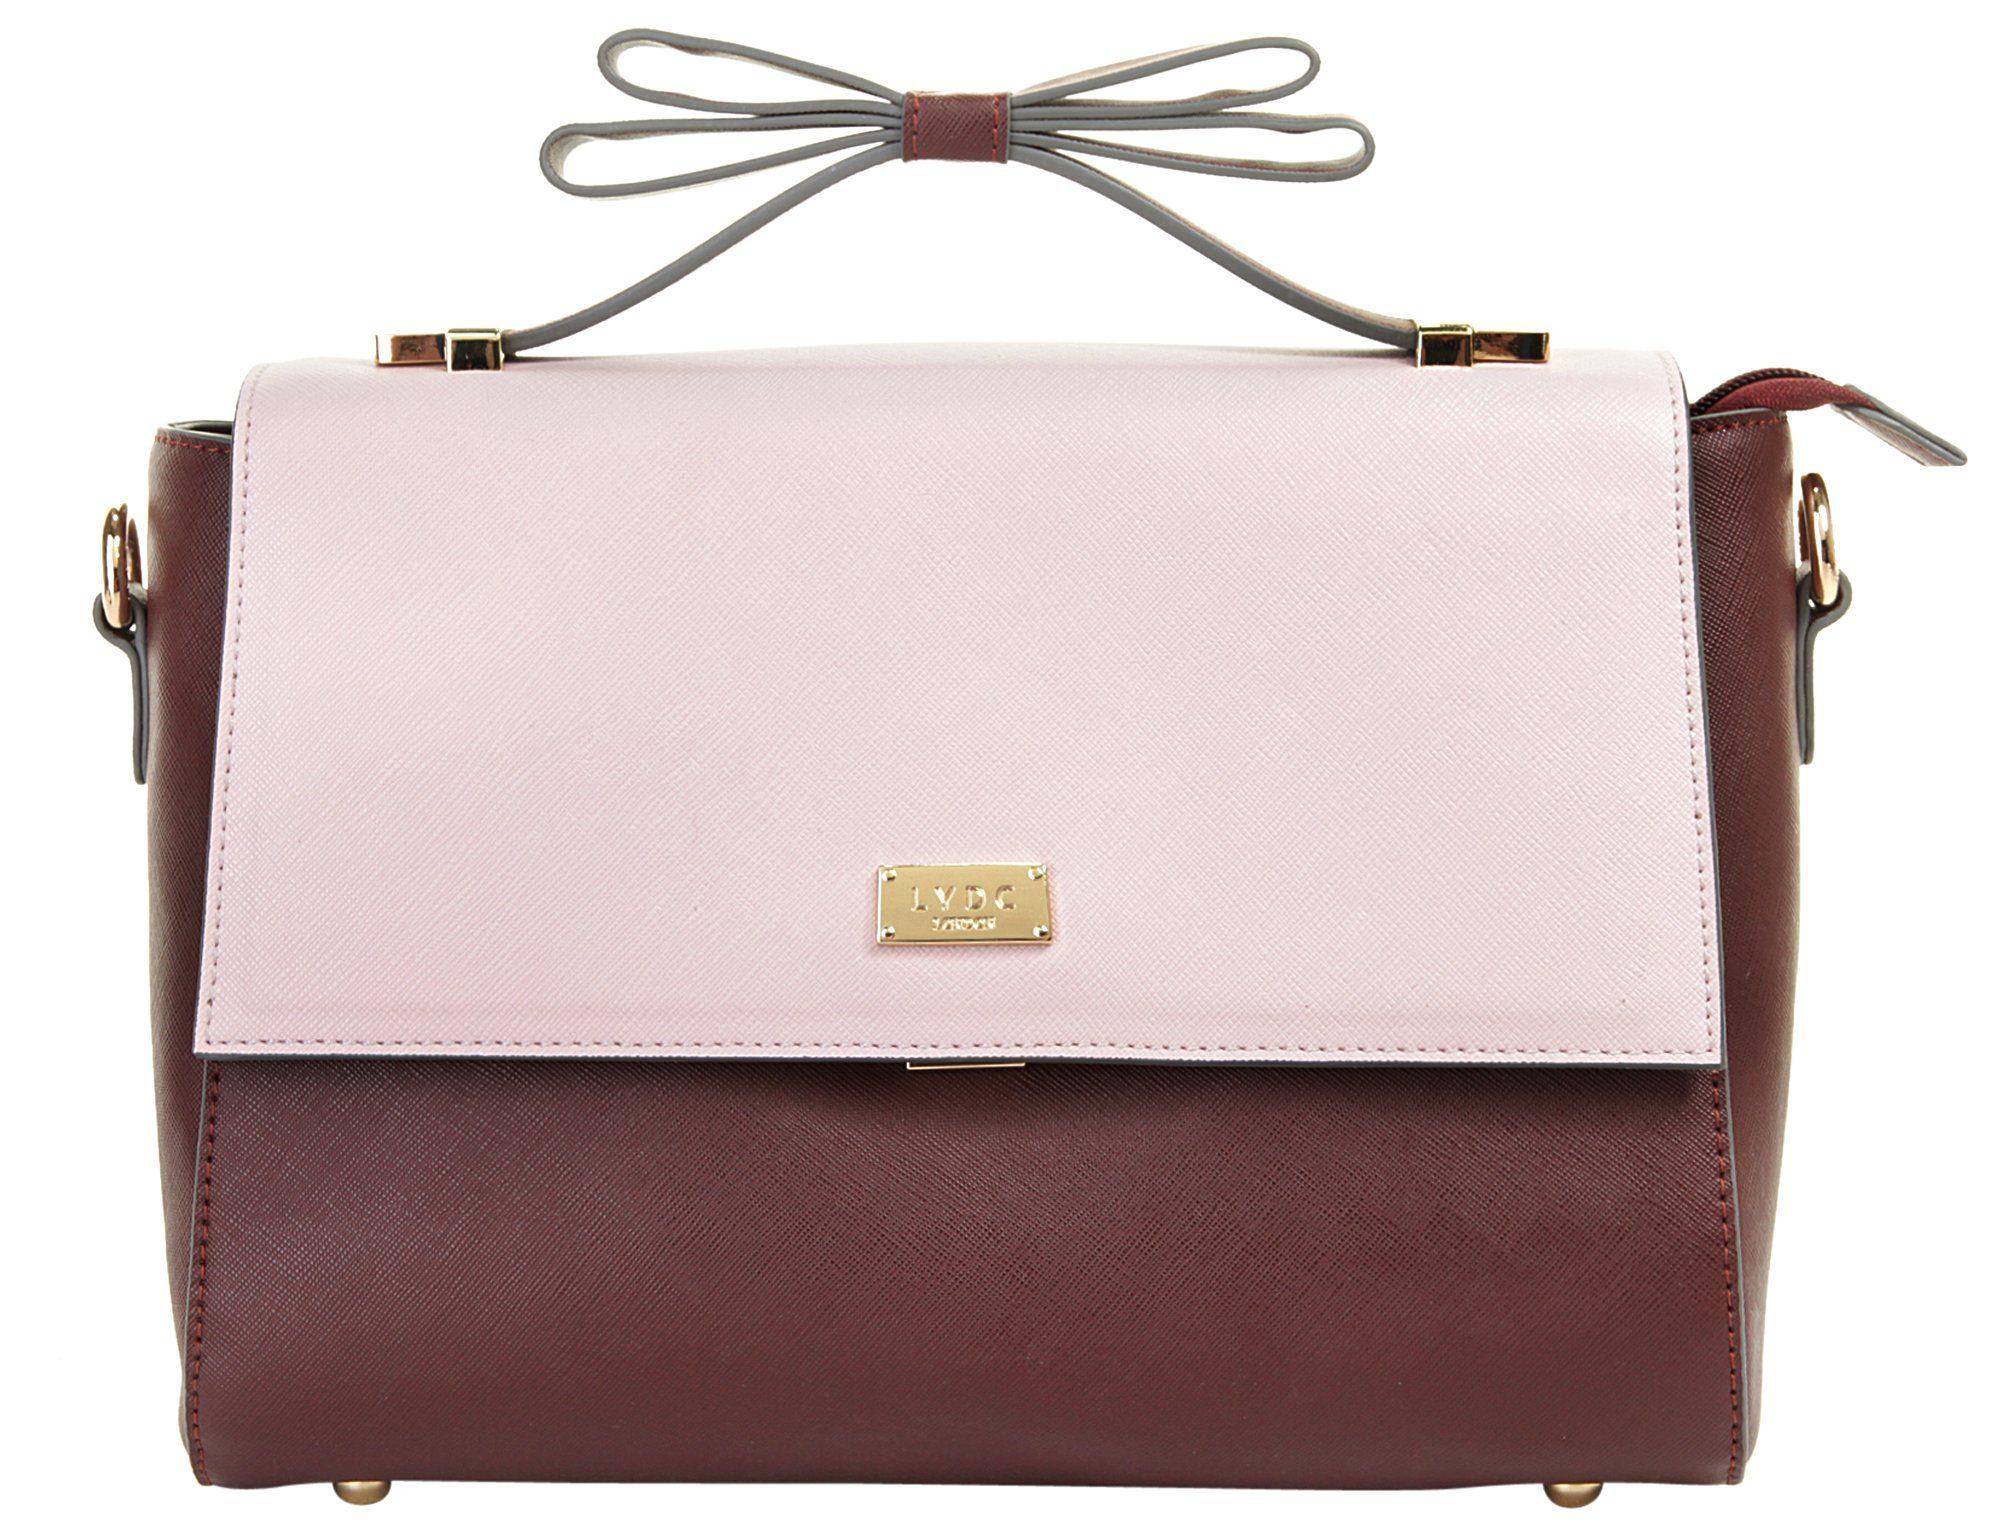 LYDC Damen Handtasche